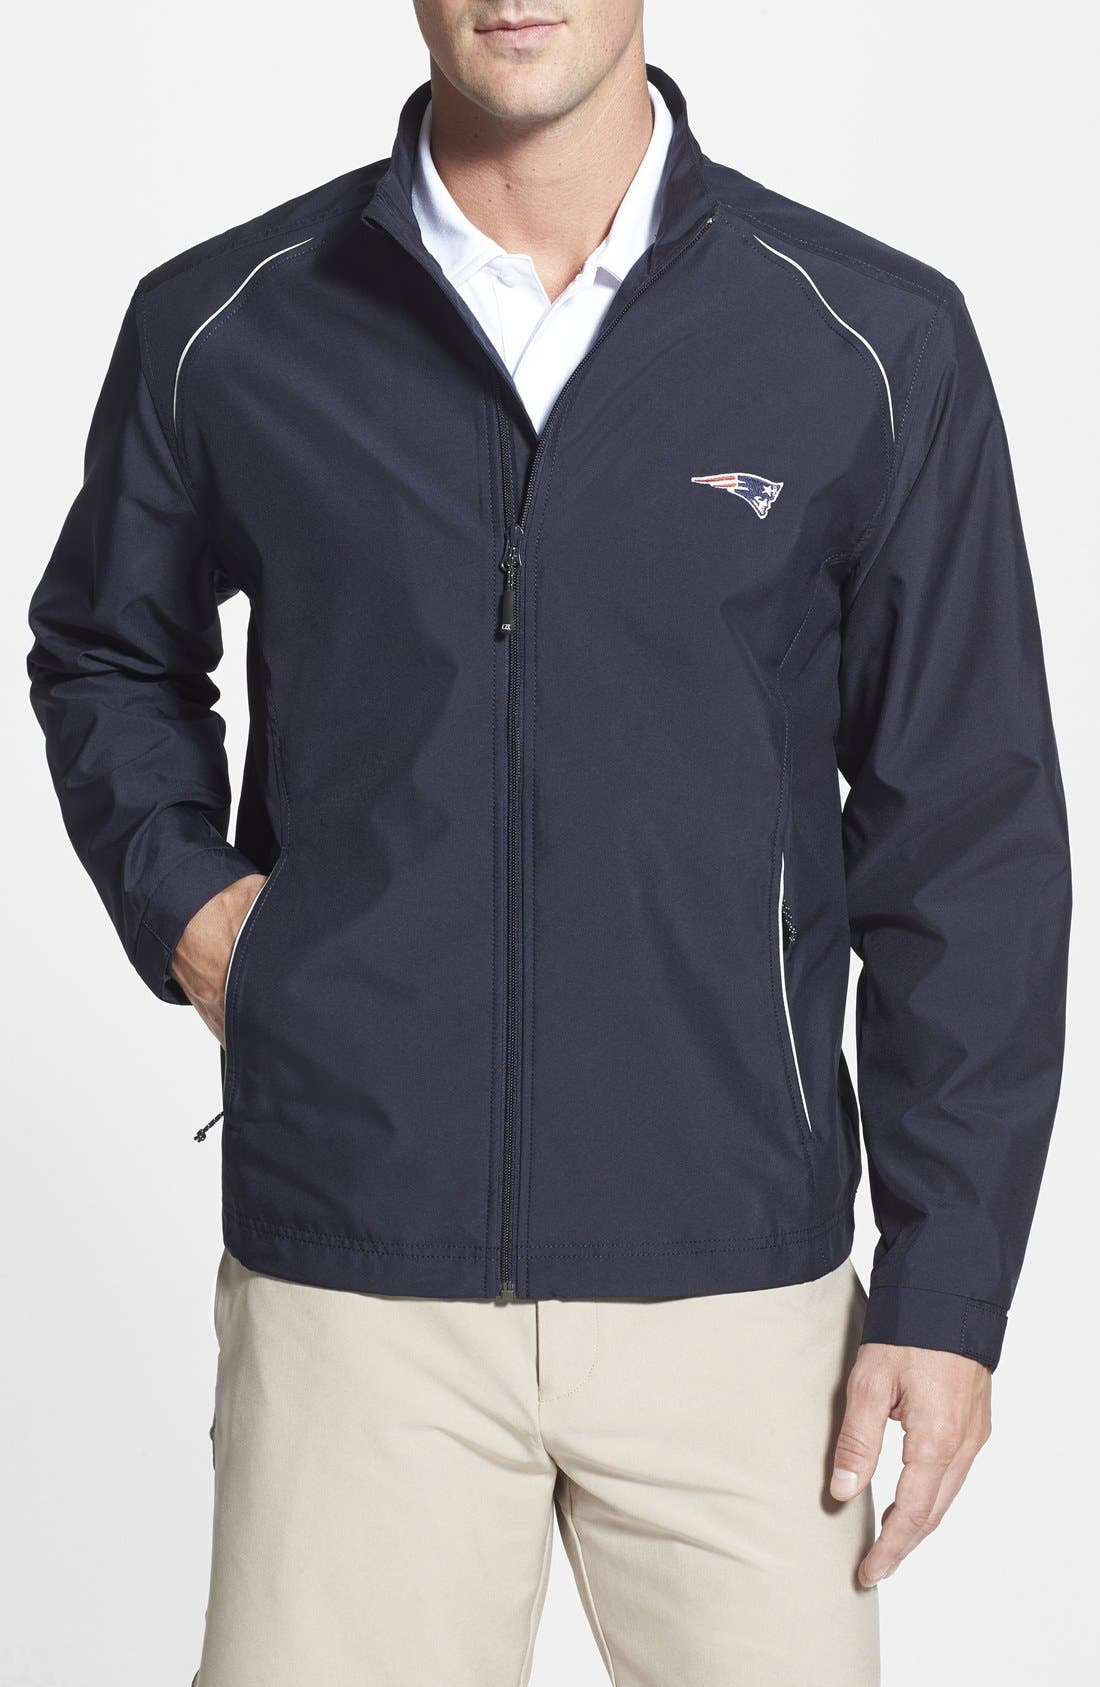 New England Patriots - Beacon WeatherTec Wind & Water Resistant Jacket,                         Main,                         color, Navy Blue